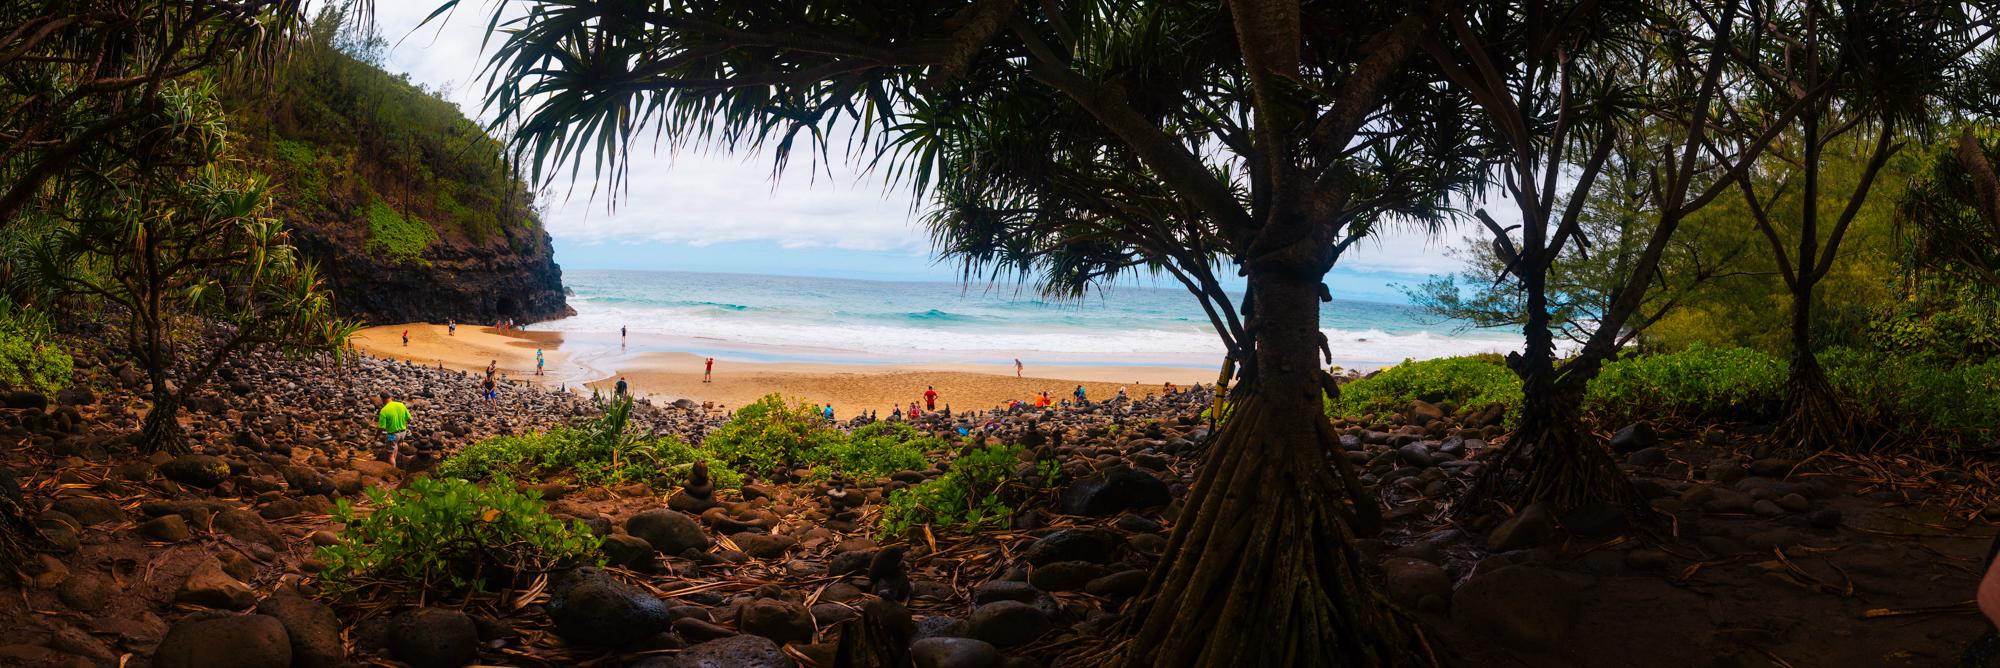 Kauai_day2_-122-Pano-2.jpg